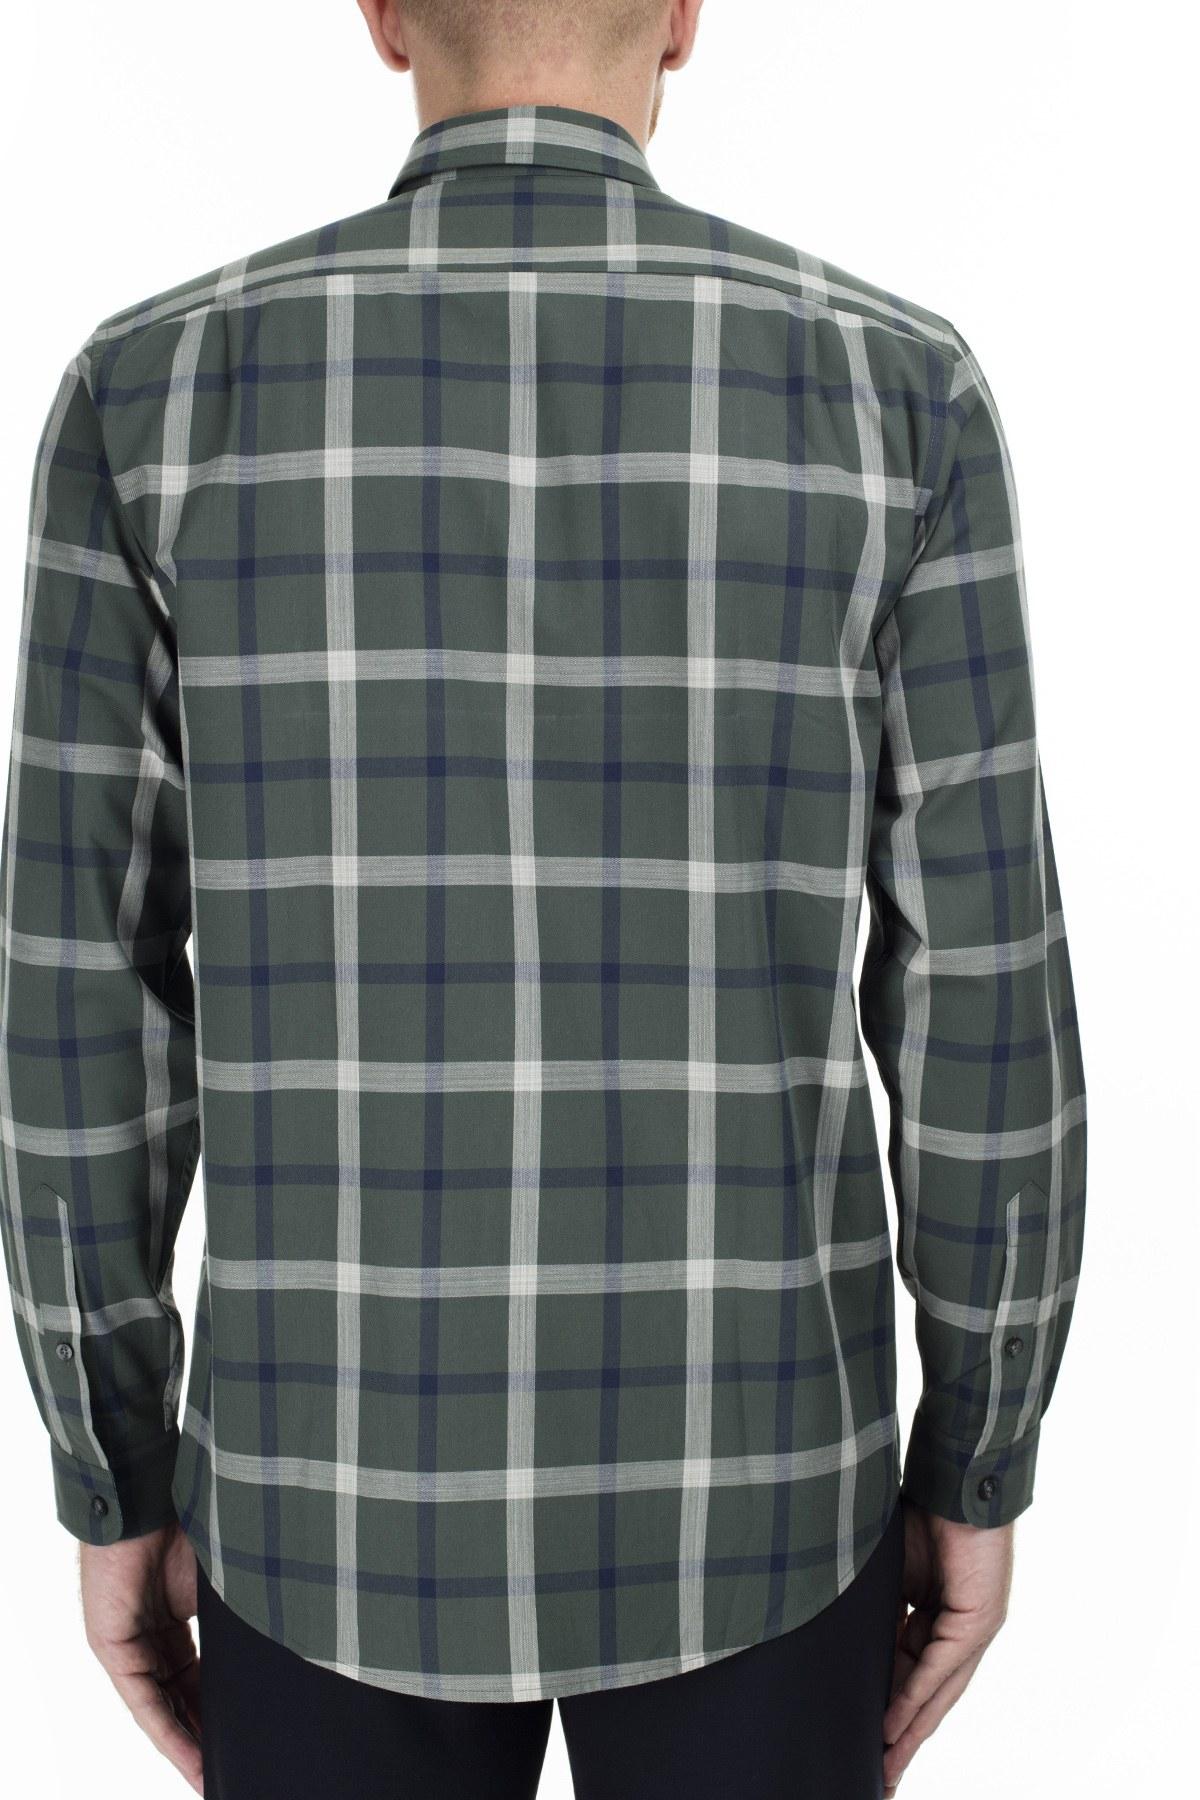 Lacoste Erkek Gömlek S CH1915 15Y YEŞİL